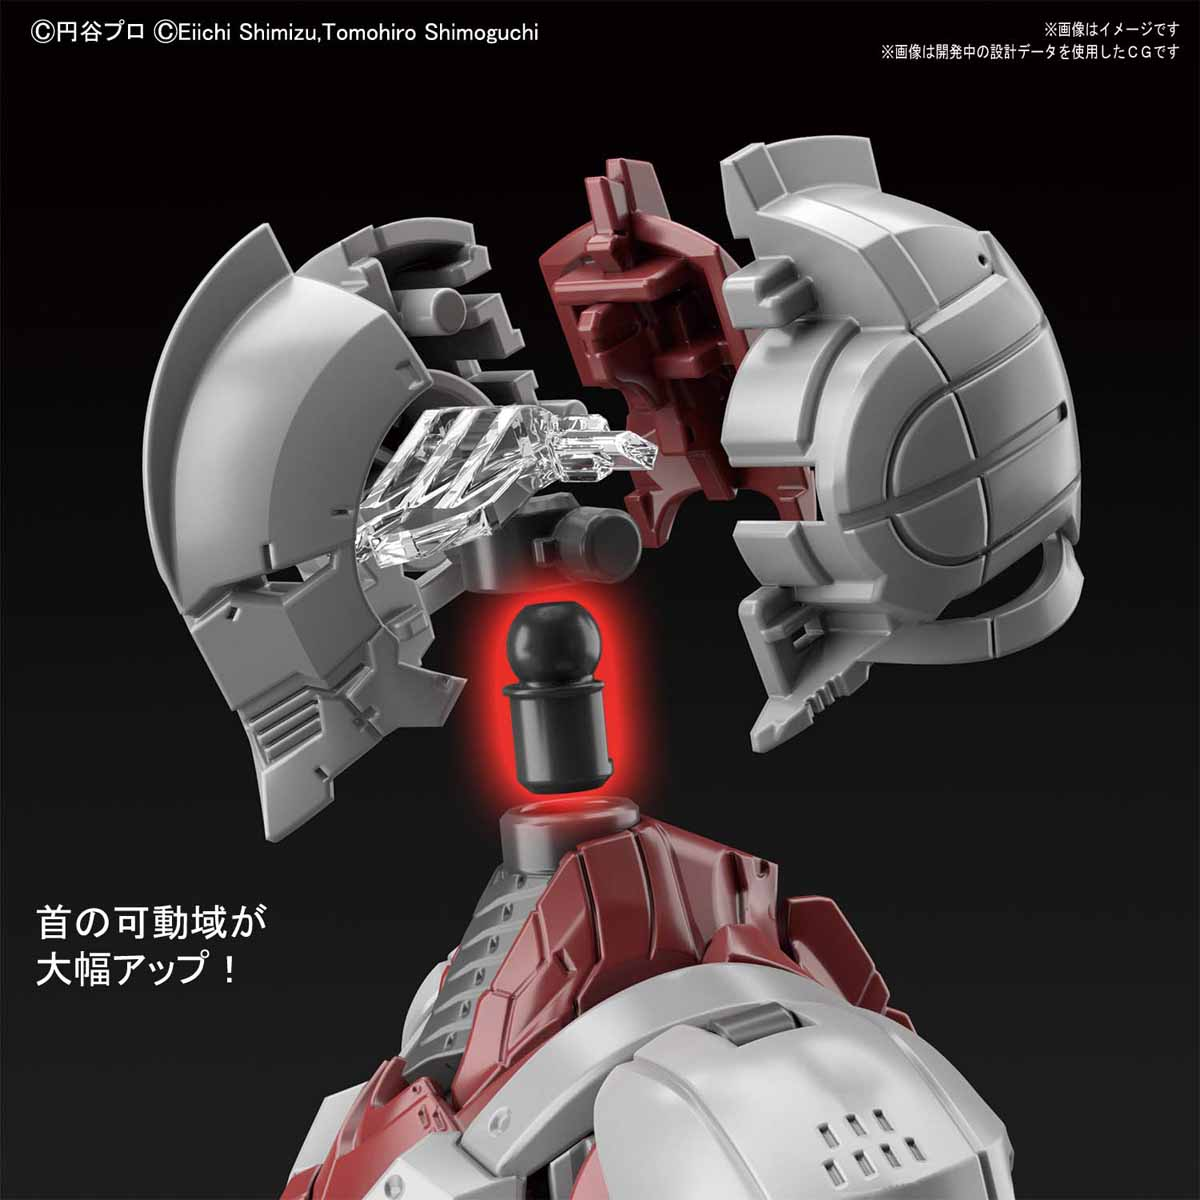 Figure-rise Standard『ULTRAMAN [B TYPE] -ACTION-』ウルトラマンスーツ 1/12 プラモデル-005